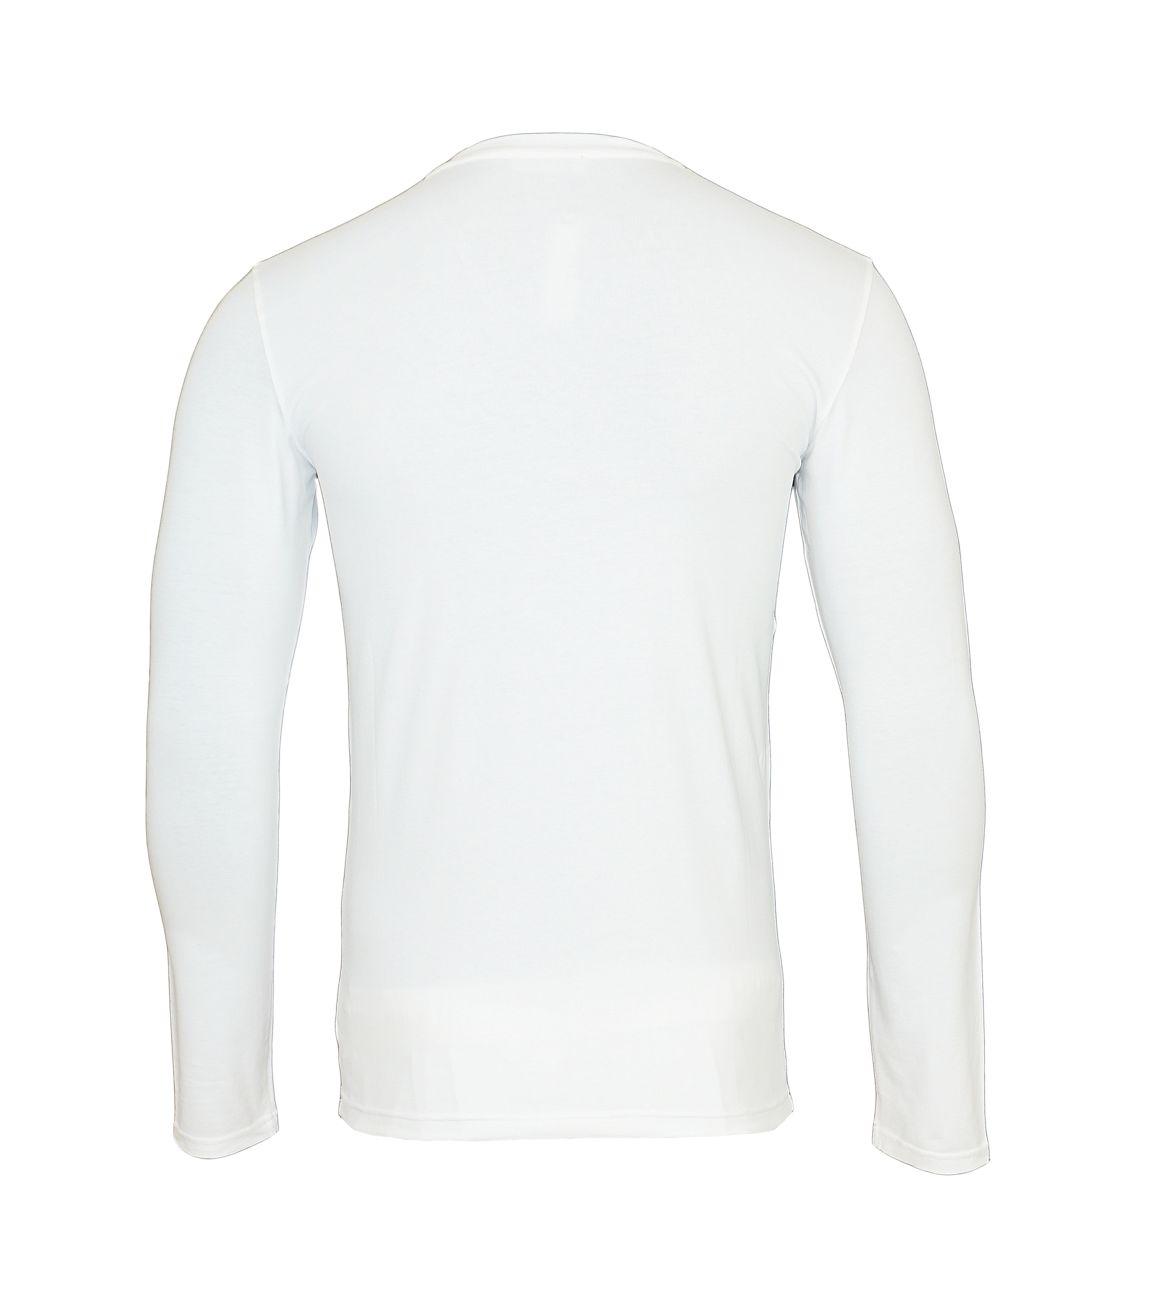 Emporio Armani Longsleeve Rundhals Shirt 111023 8A512 00010 BIANCO WX18-EAL